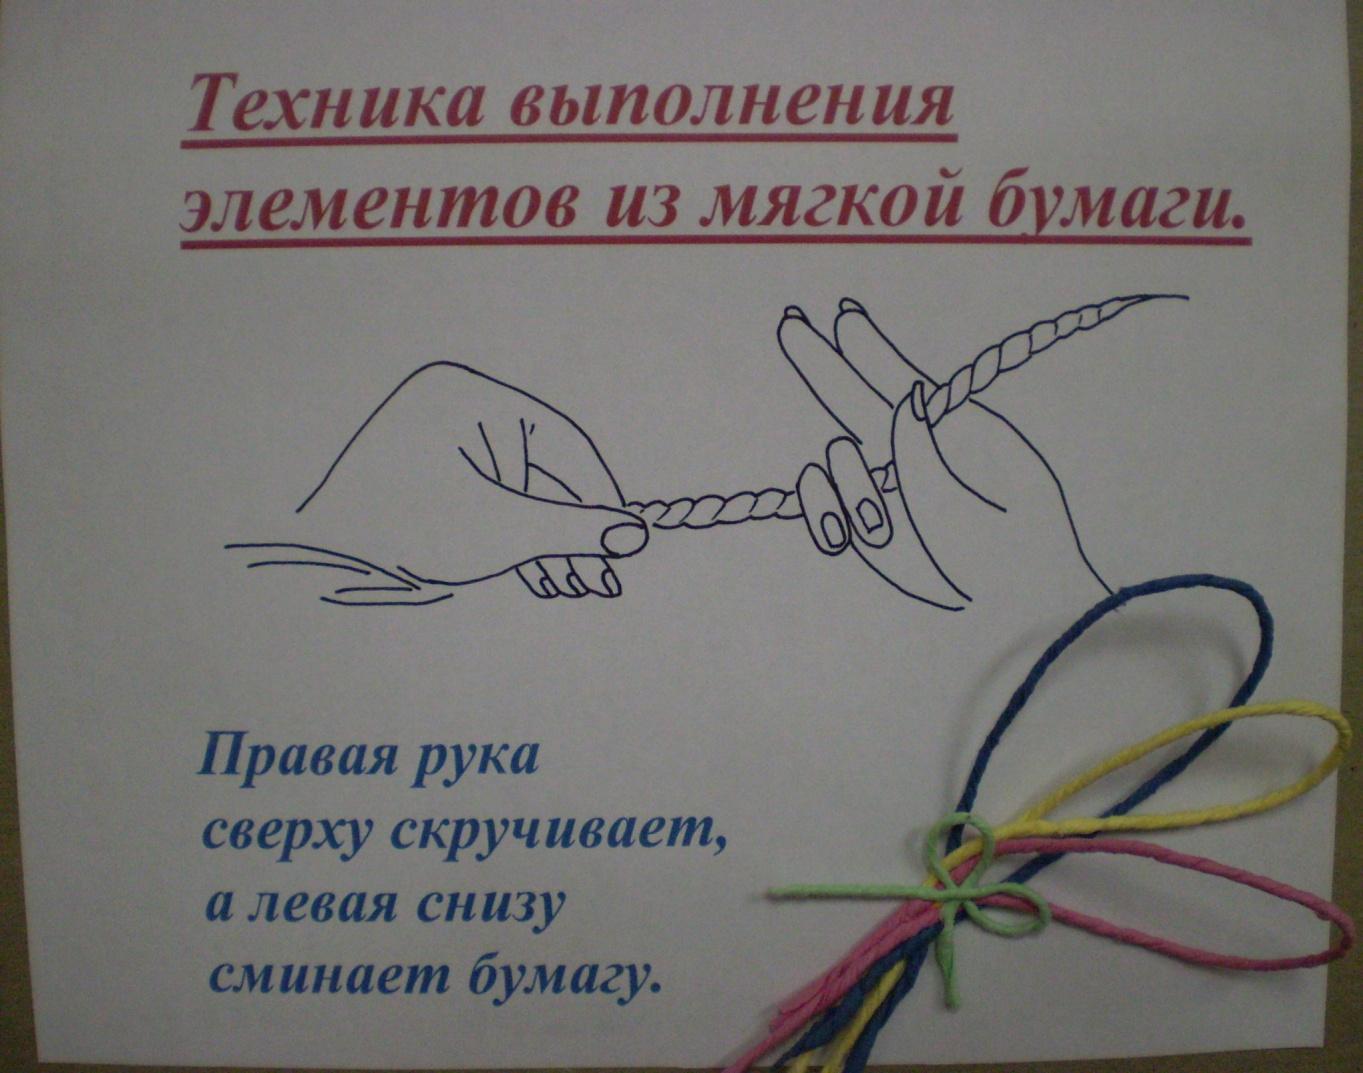 C:\Documents and Settings\Admin\Рабочий стол\диск\И.А.Фото\PB120004.JPG